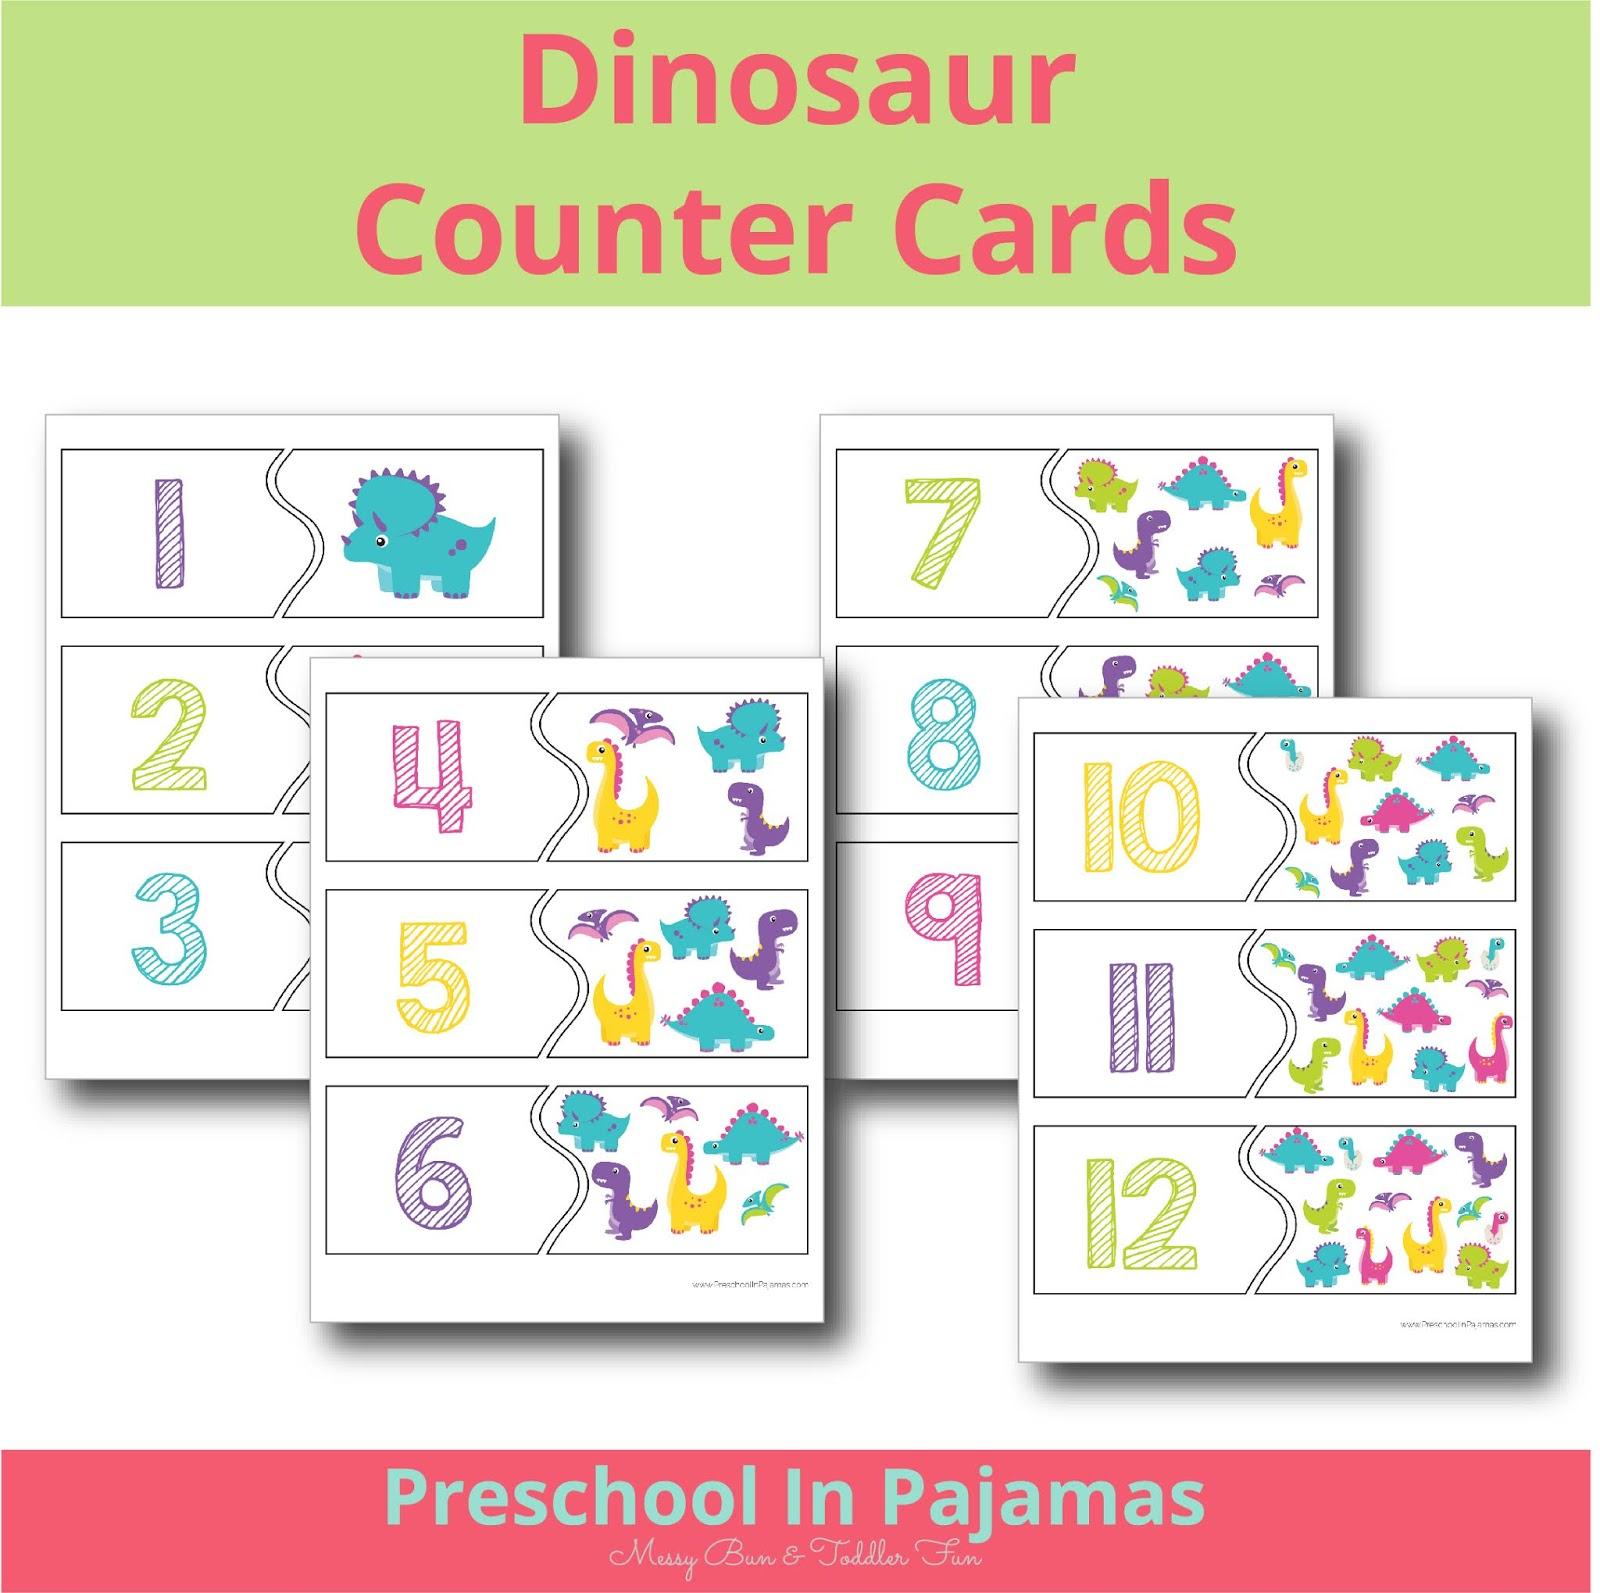 Free Dinosaur Counter Cards Printable